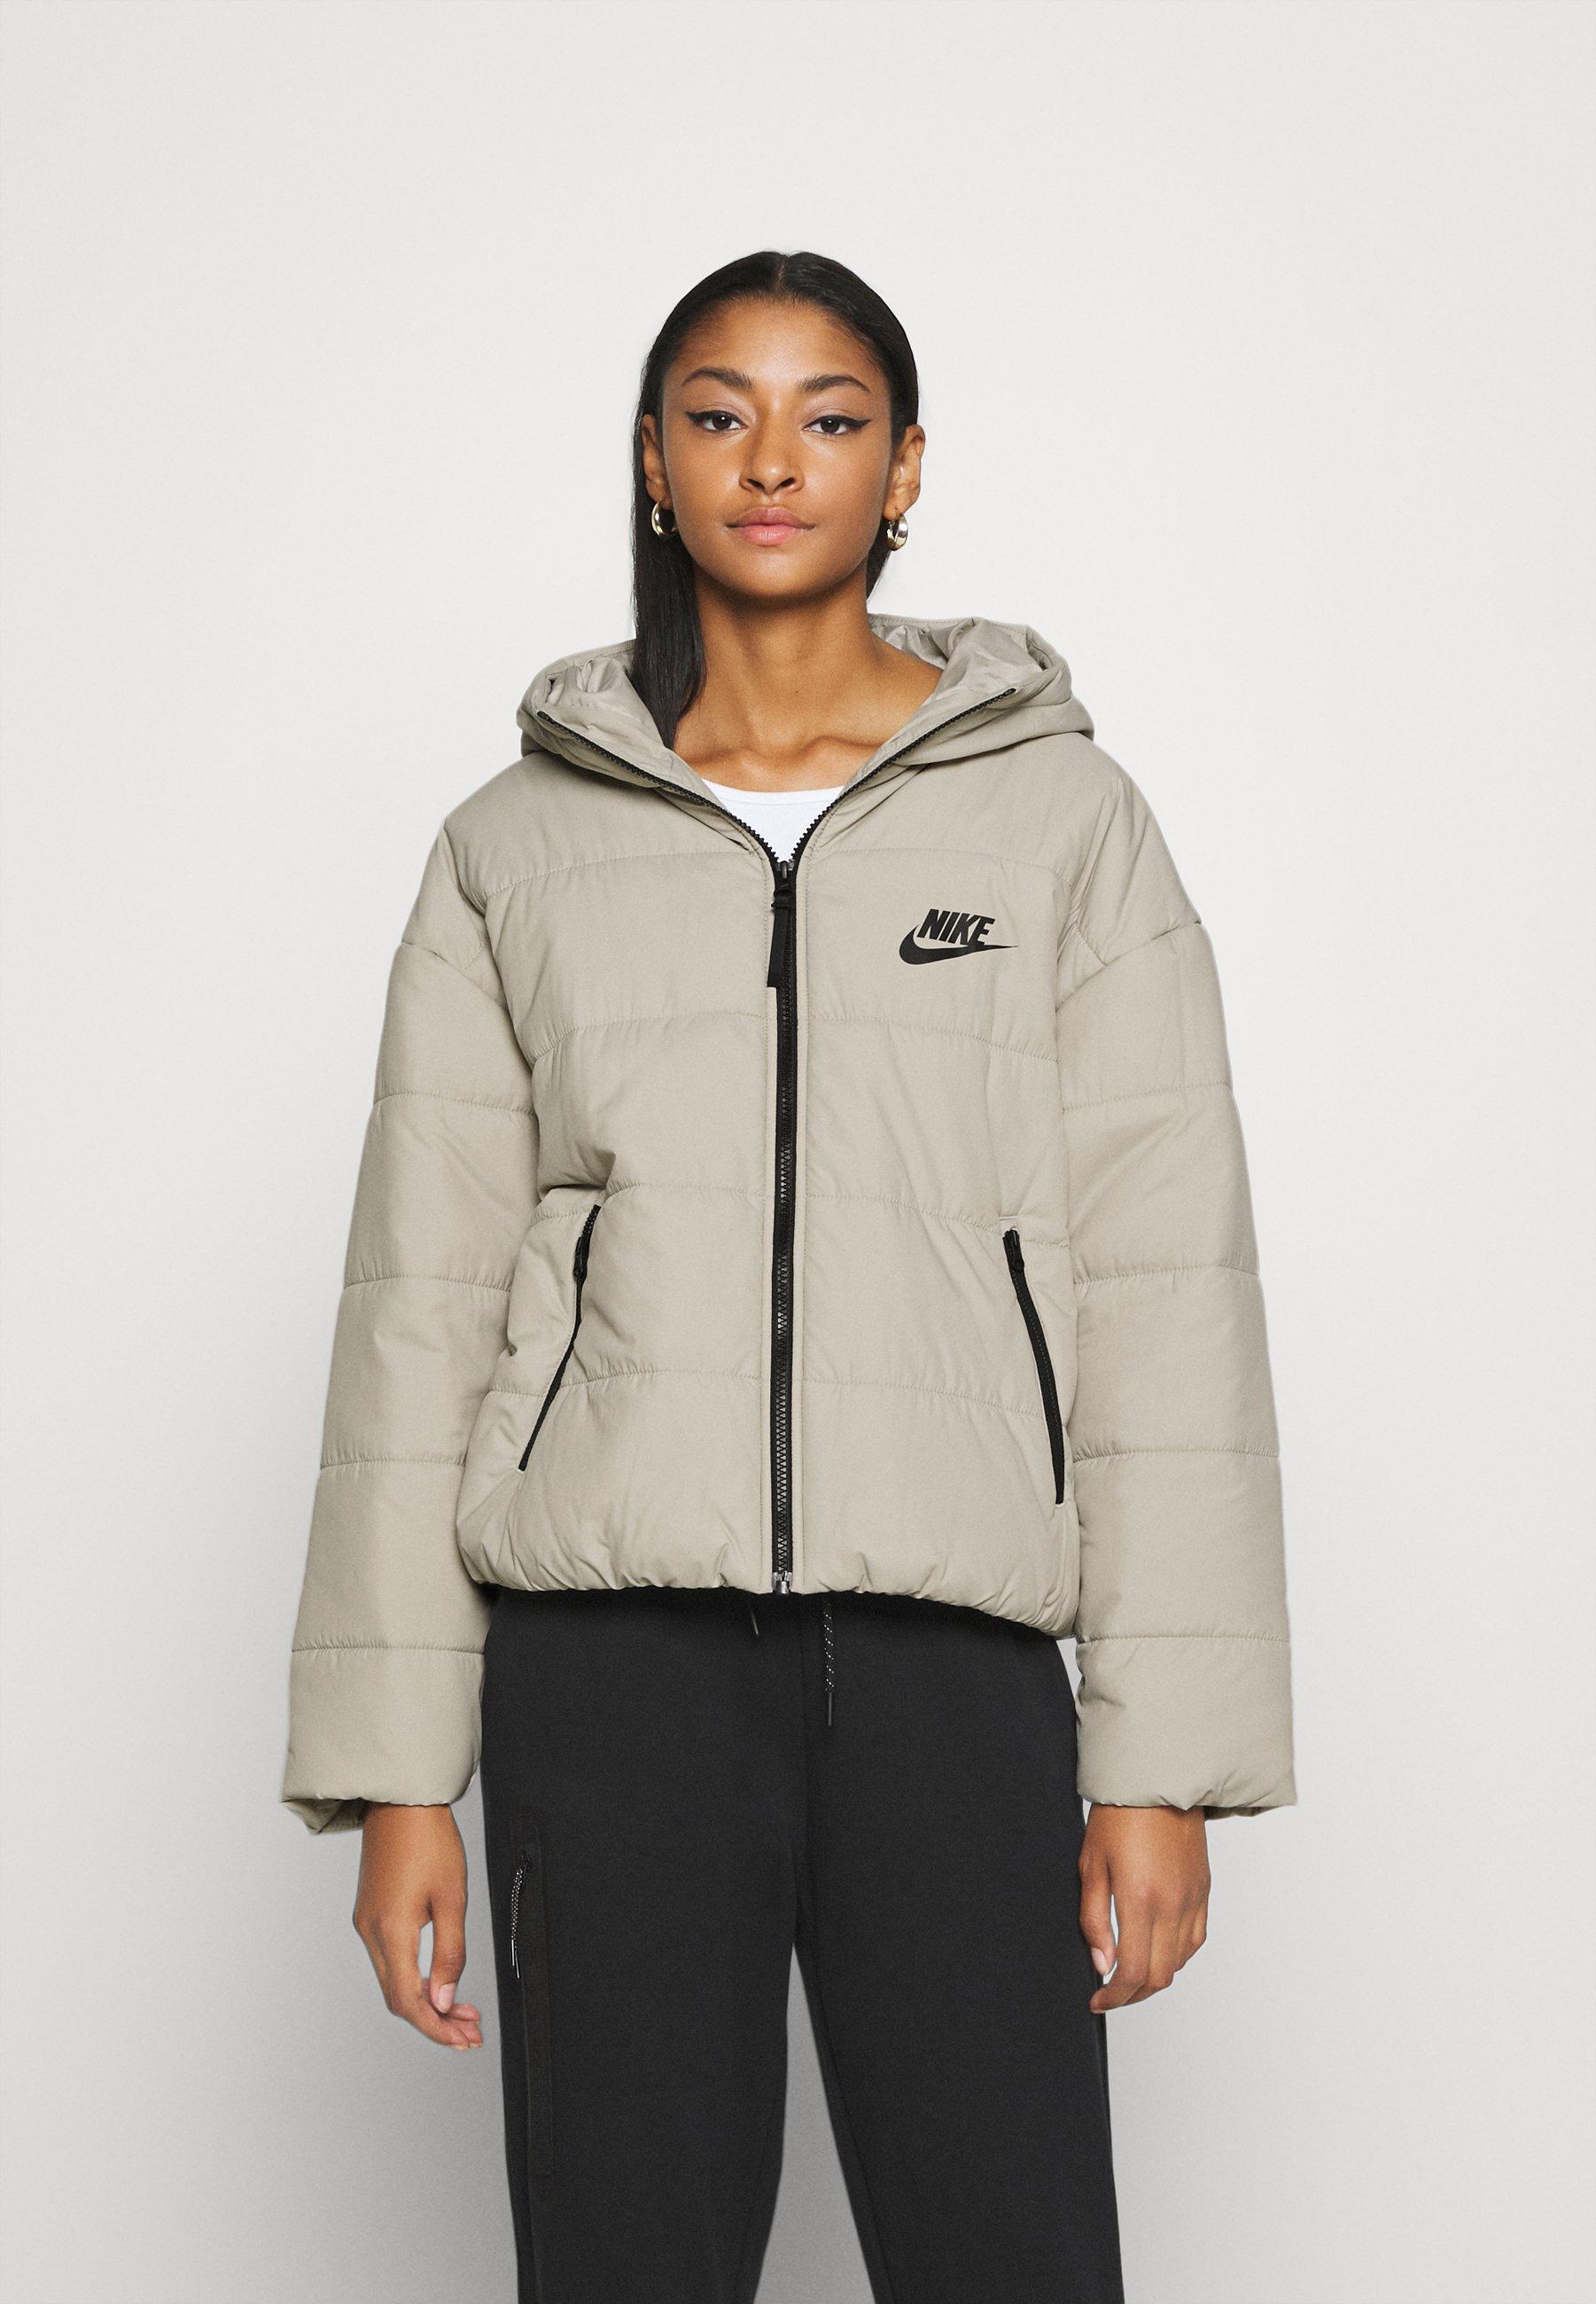 Nike Sportswear Jackor Dam . Köp damjackor online på Zalando.se